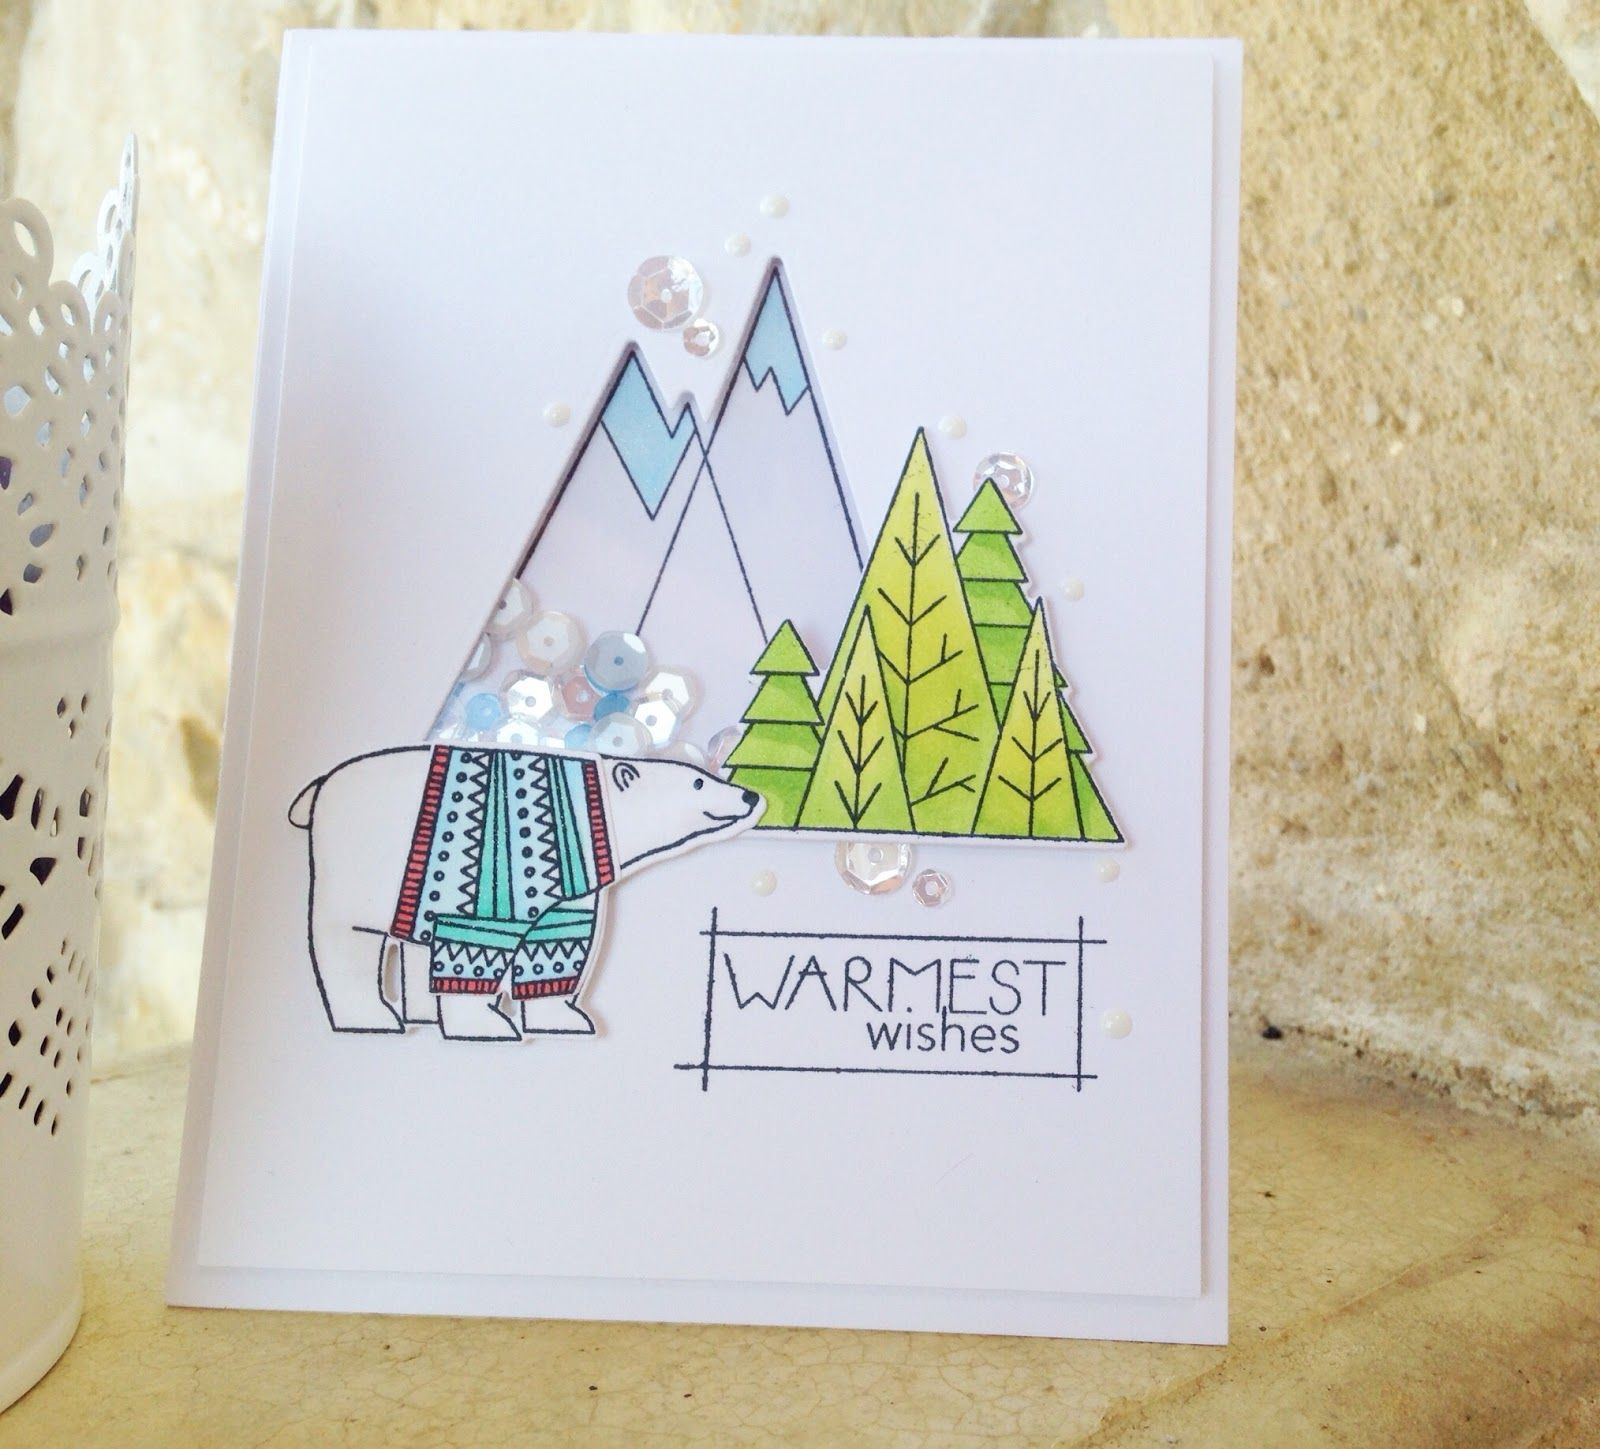 Shaker mountain pti nov blog hop cas graphic cards pinterest shaker mountain pti nov blog hop kristyandbryce Images